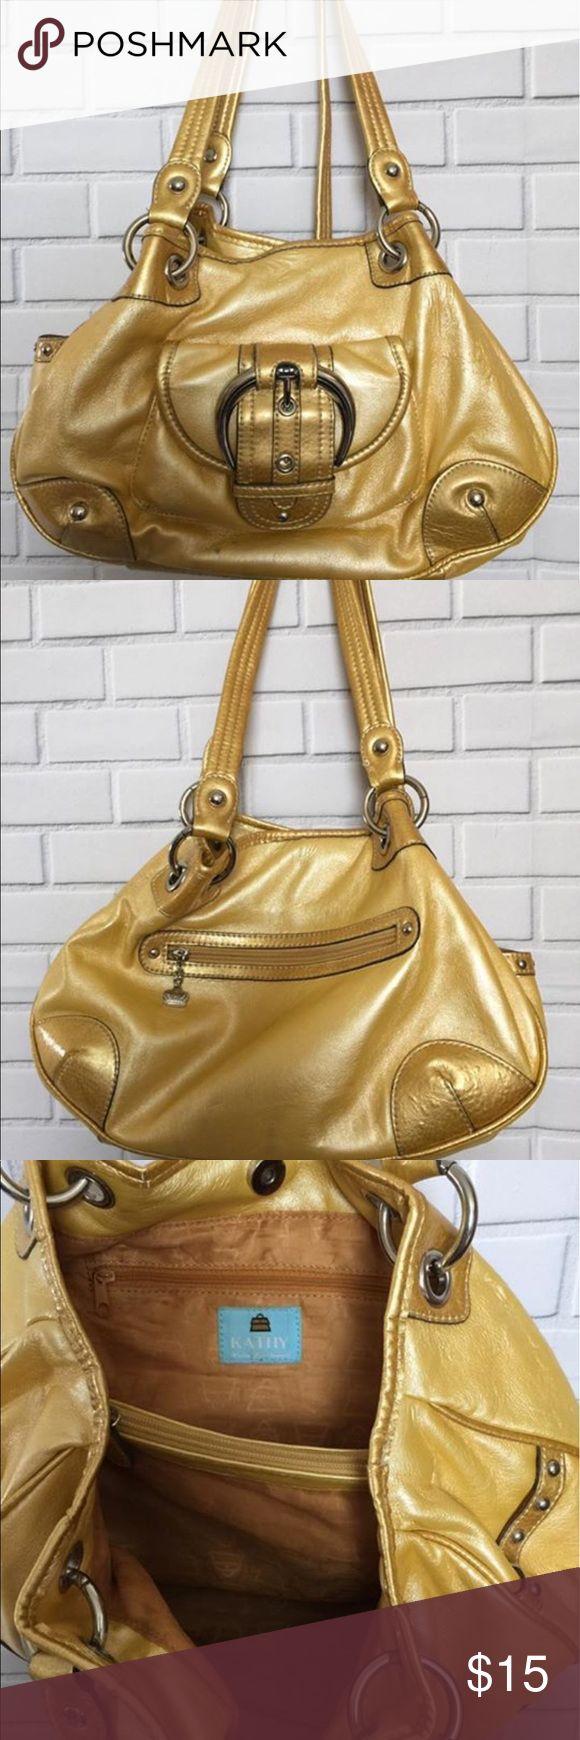 Kathy Van Zeeland hobo purse Golden yellow Kathy Van Zeeland hobo style purse. Has a few marks/ signs of use, as seen in photos. Still a great bag! Kathy Van Zeeland Bags Hobos